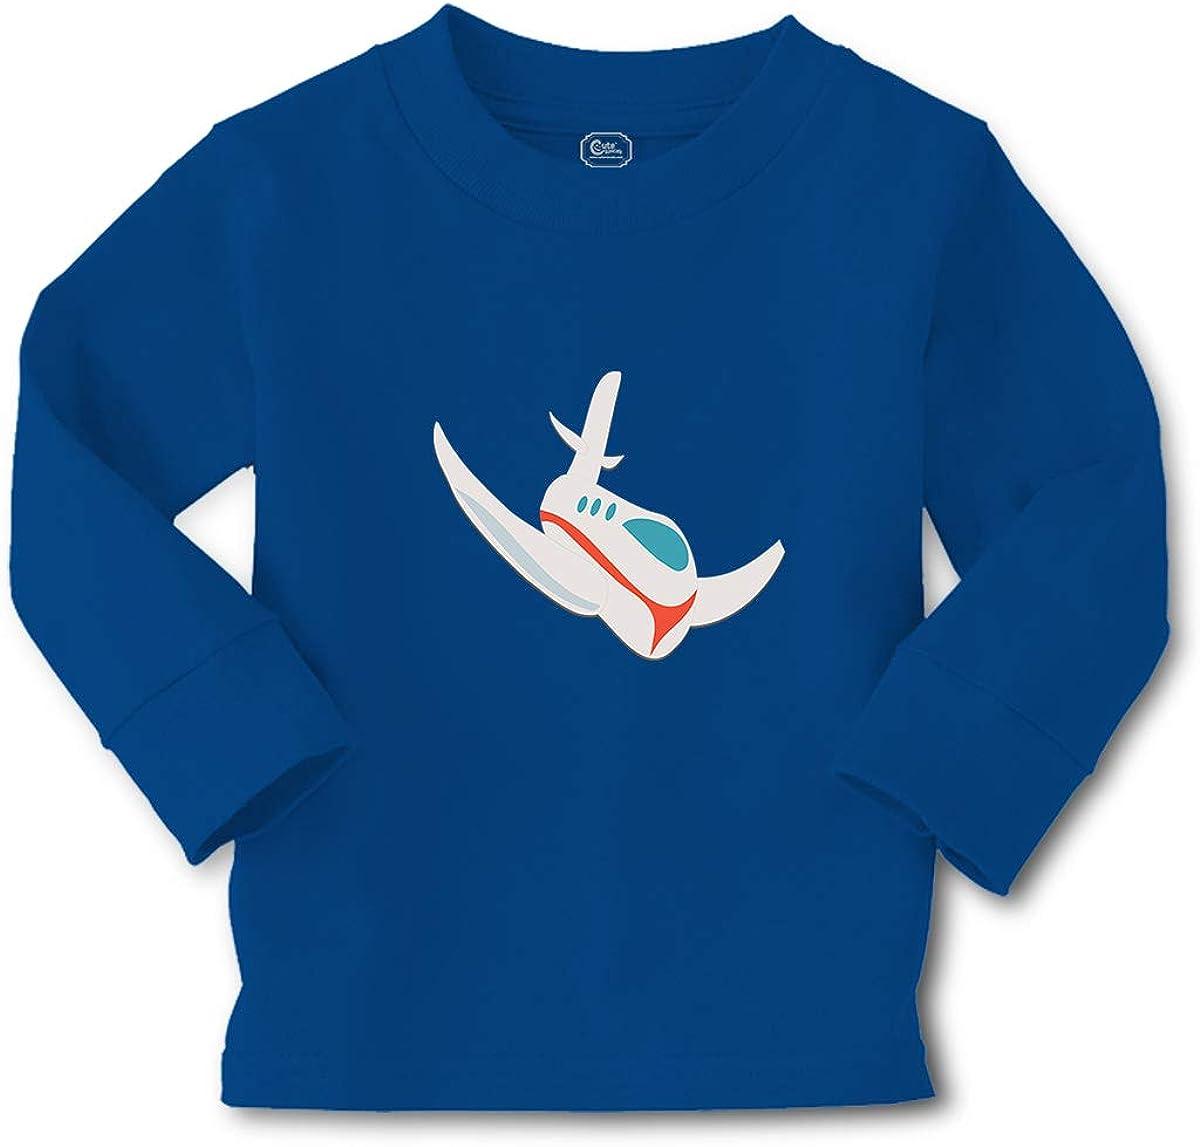 Cute Rascals Kids Long Sleeve T Shirt Airplane Flying Cotton Boy & Girl Clothes